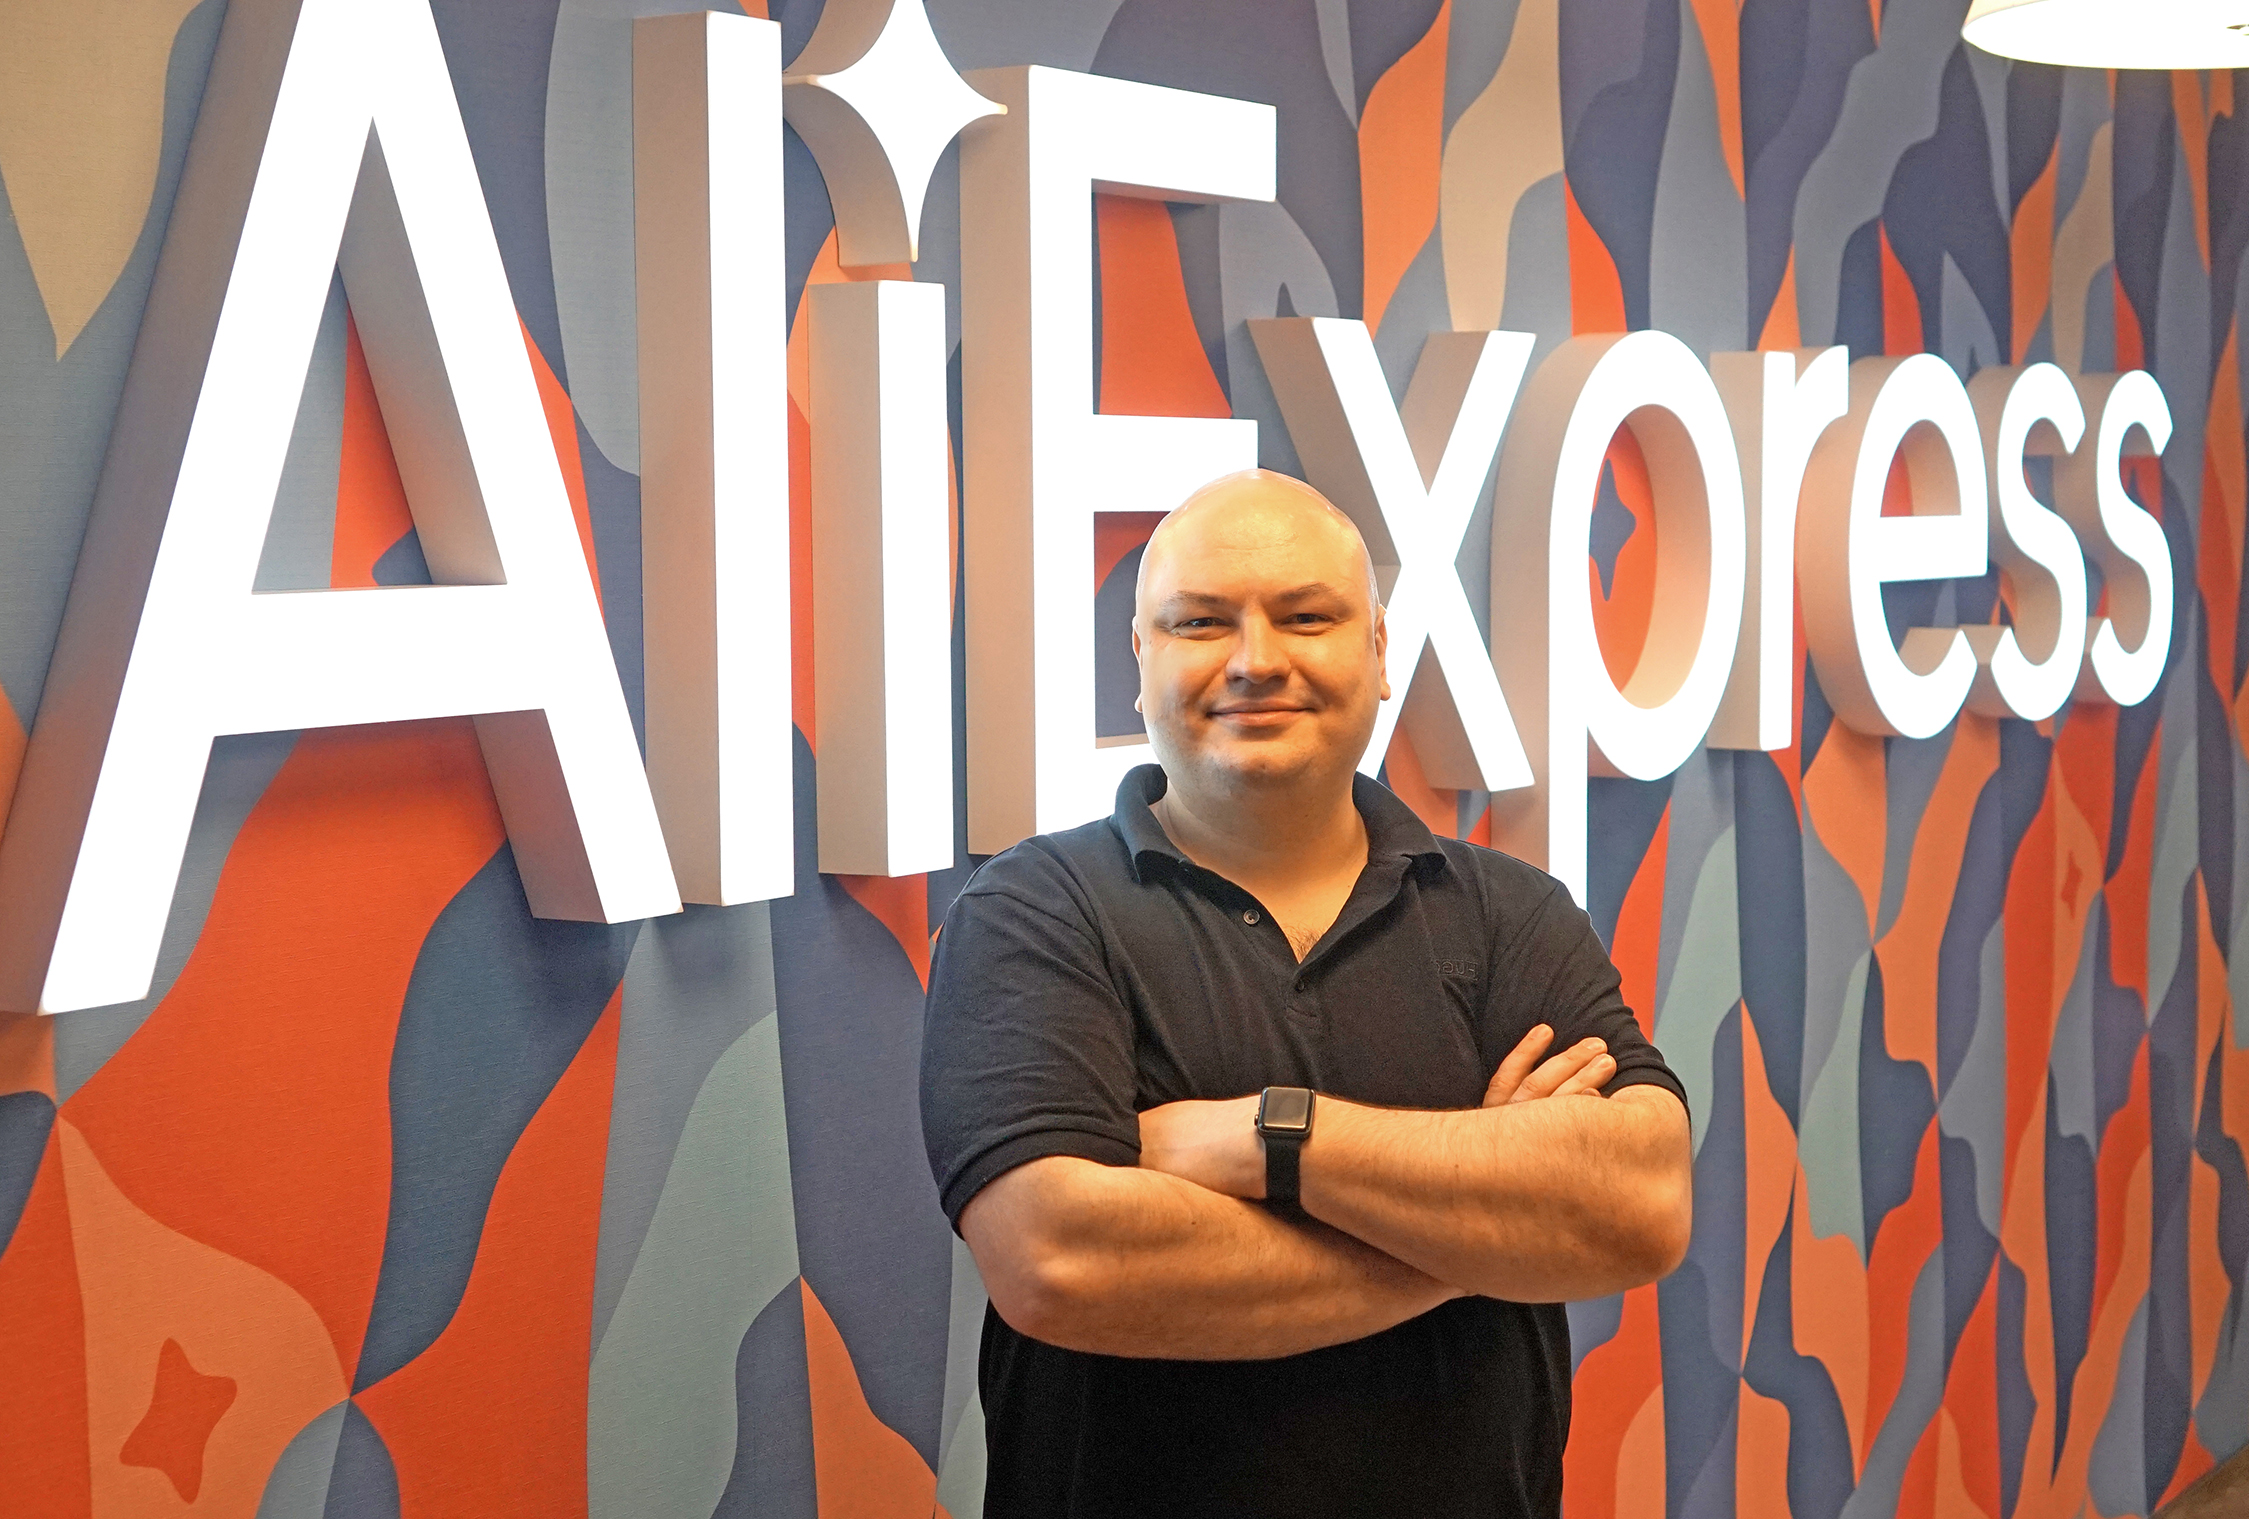 Техническим директором AliExpress Россия назначен Анатолий Орлов